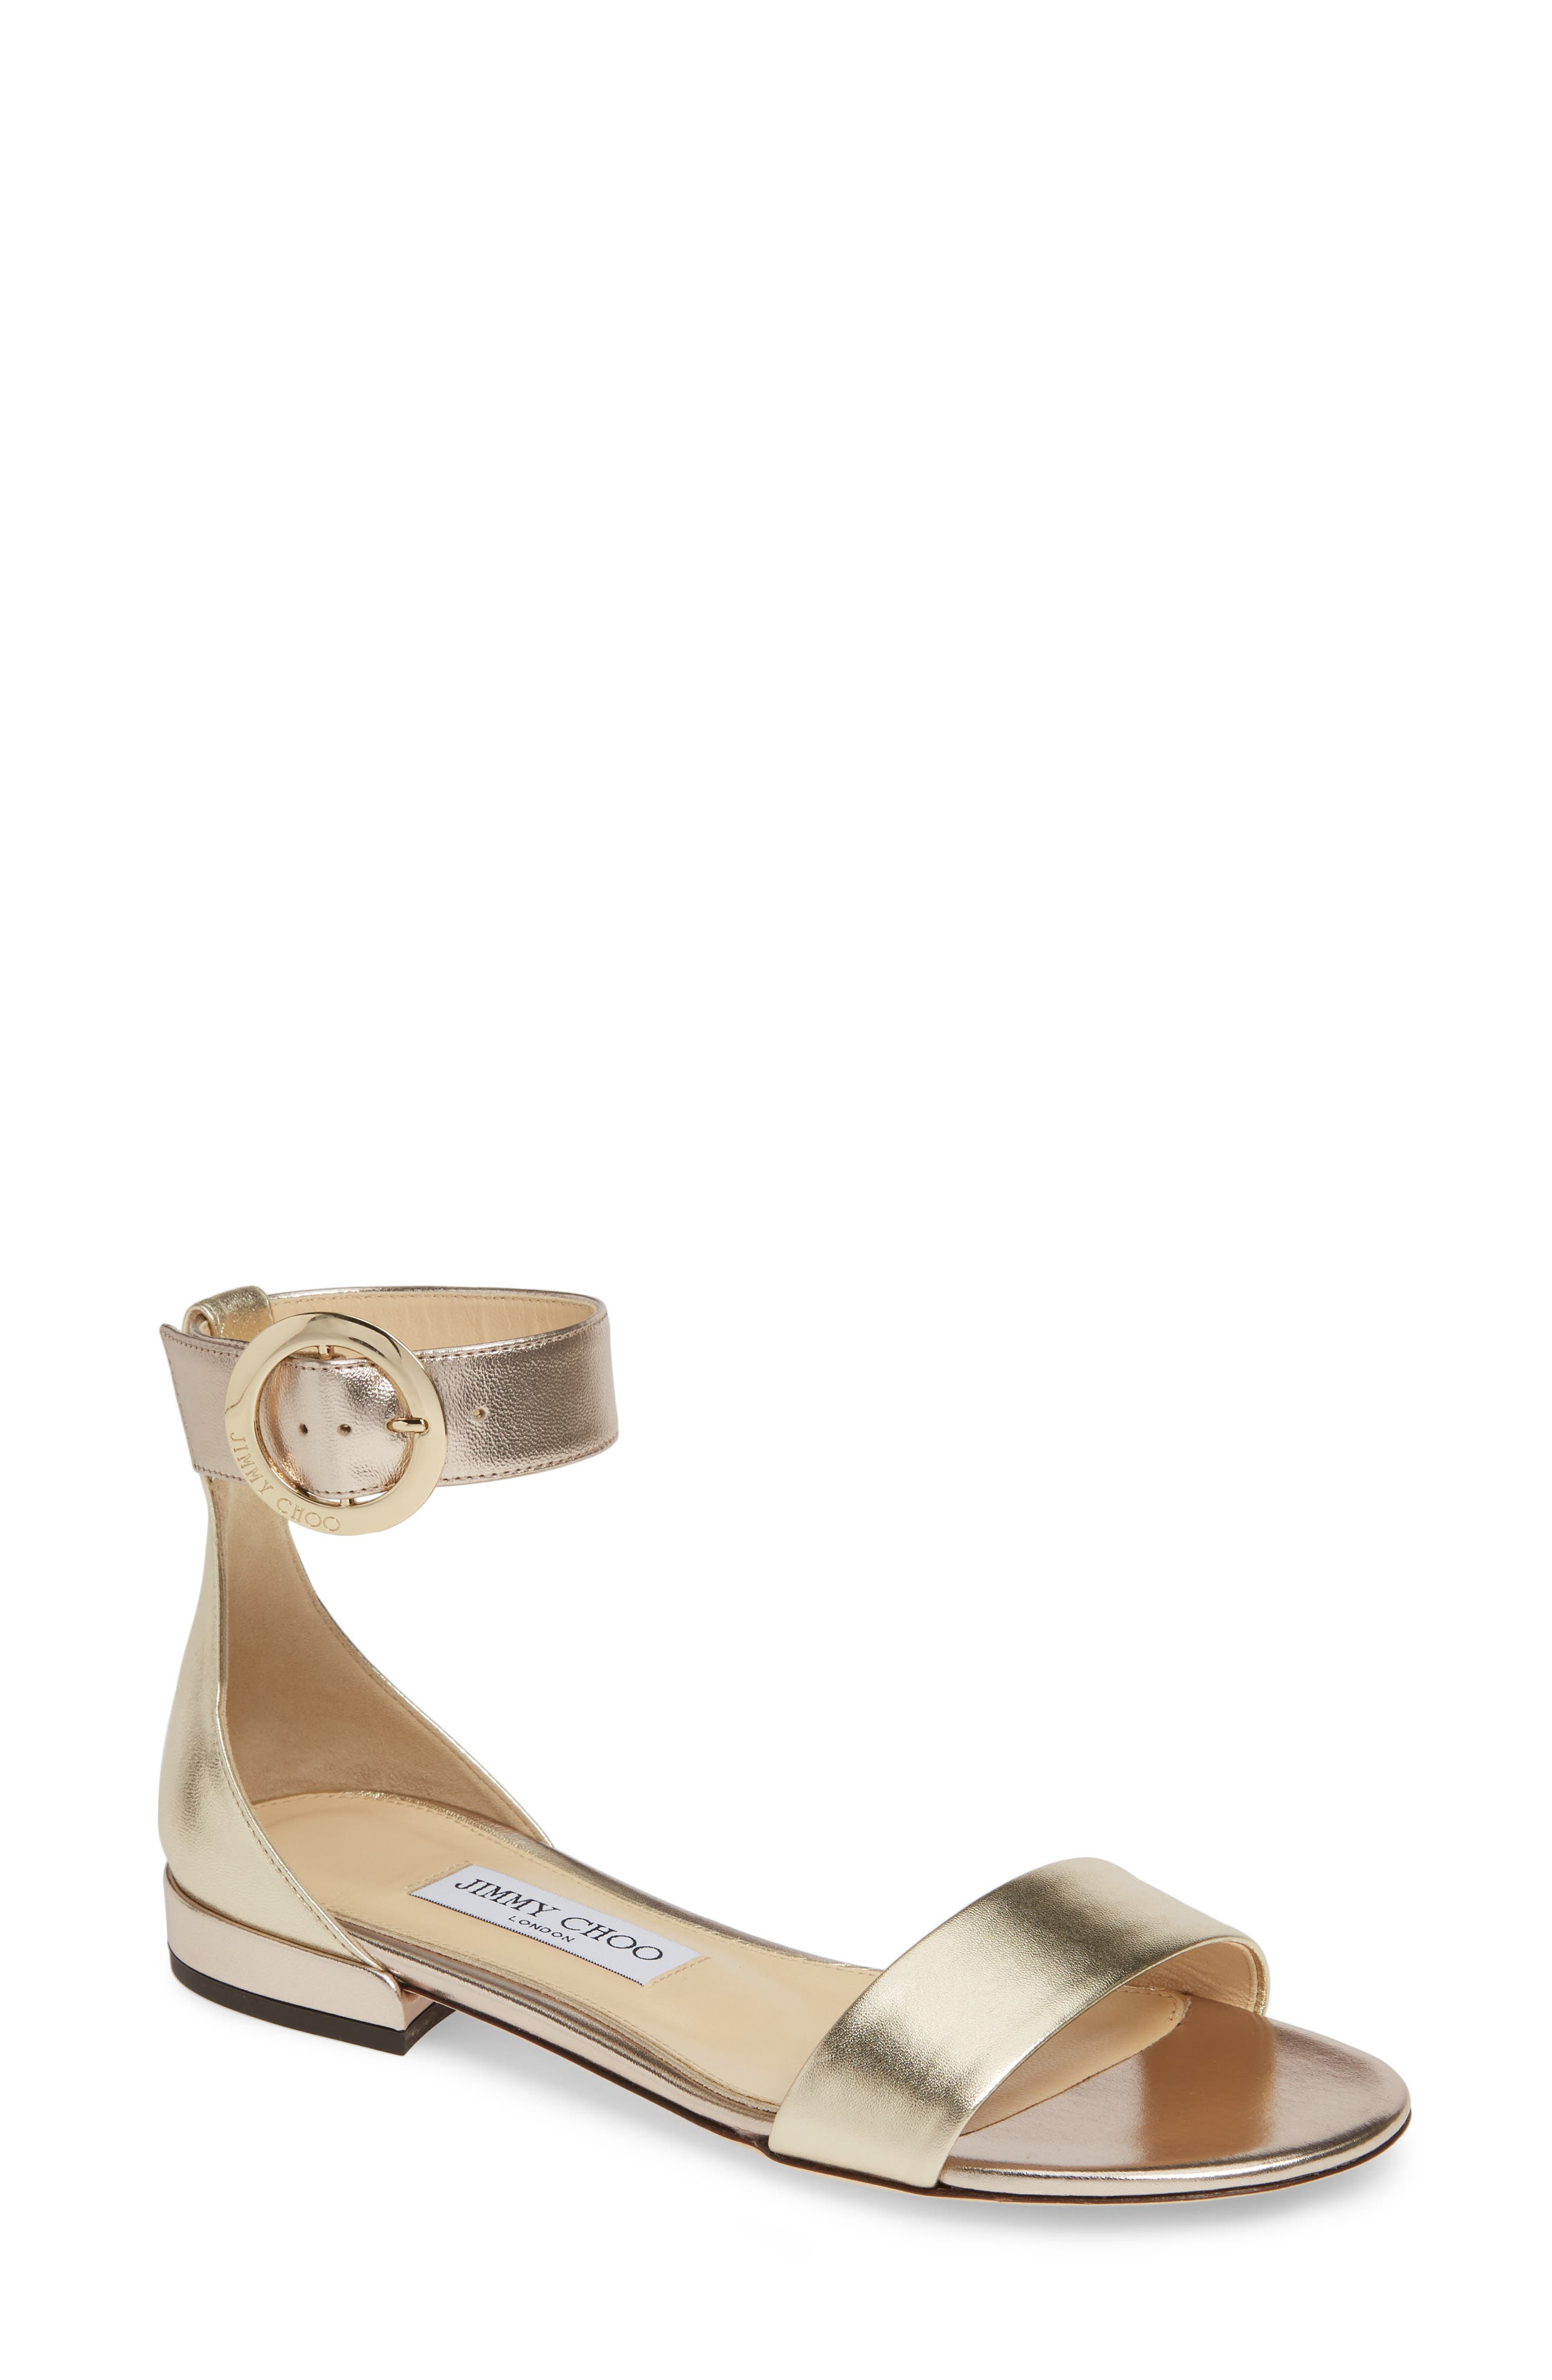 Jimmy Choo Jaimie Ankle Strap Sandal, Metallic